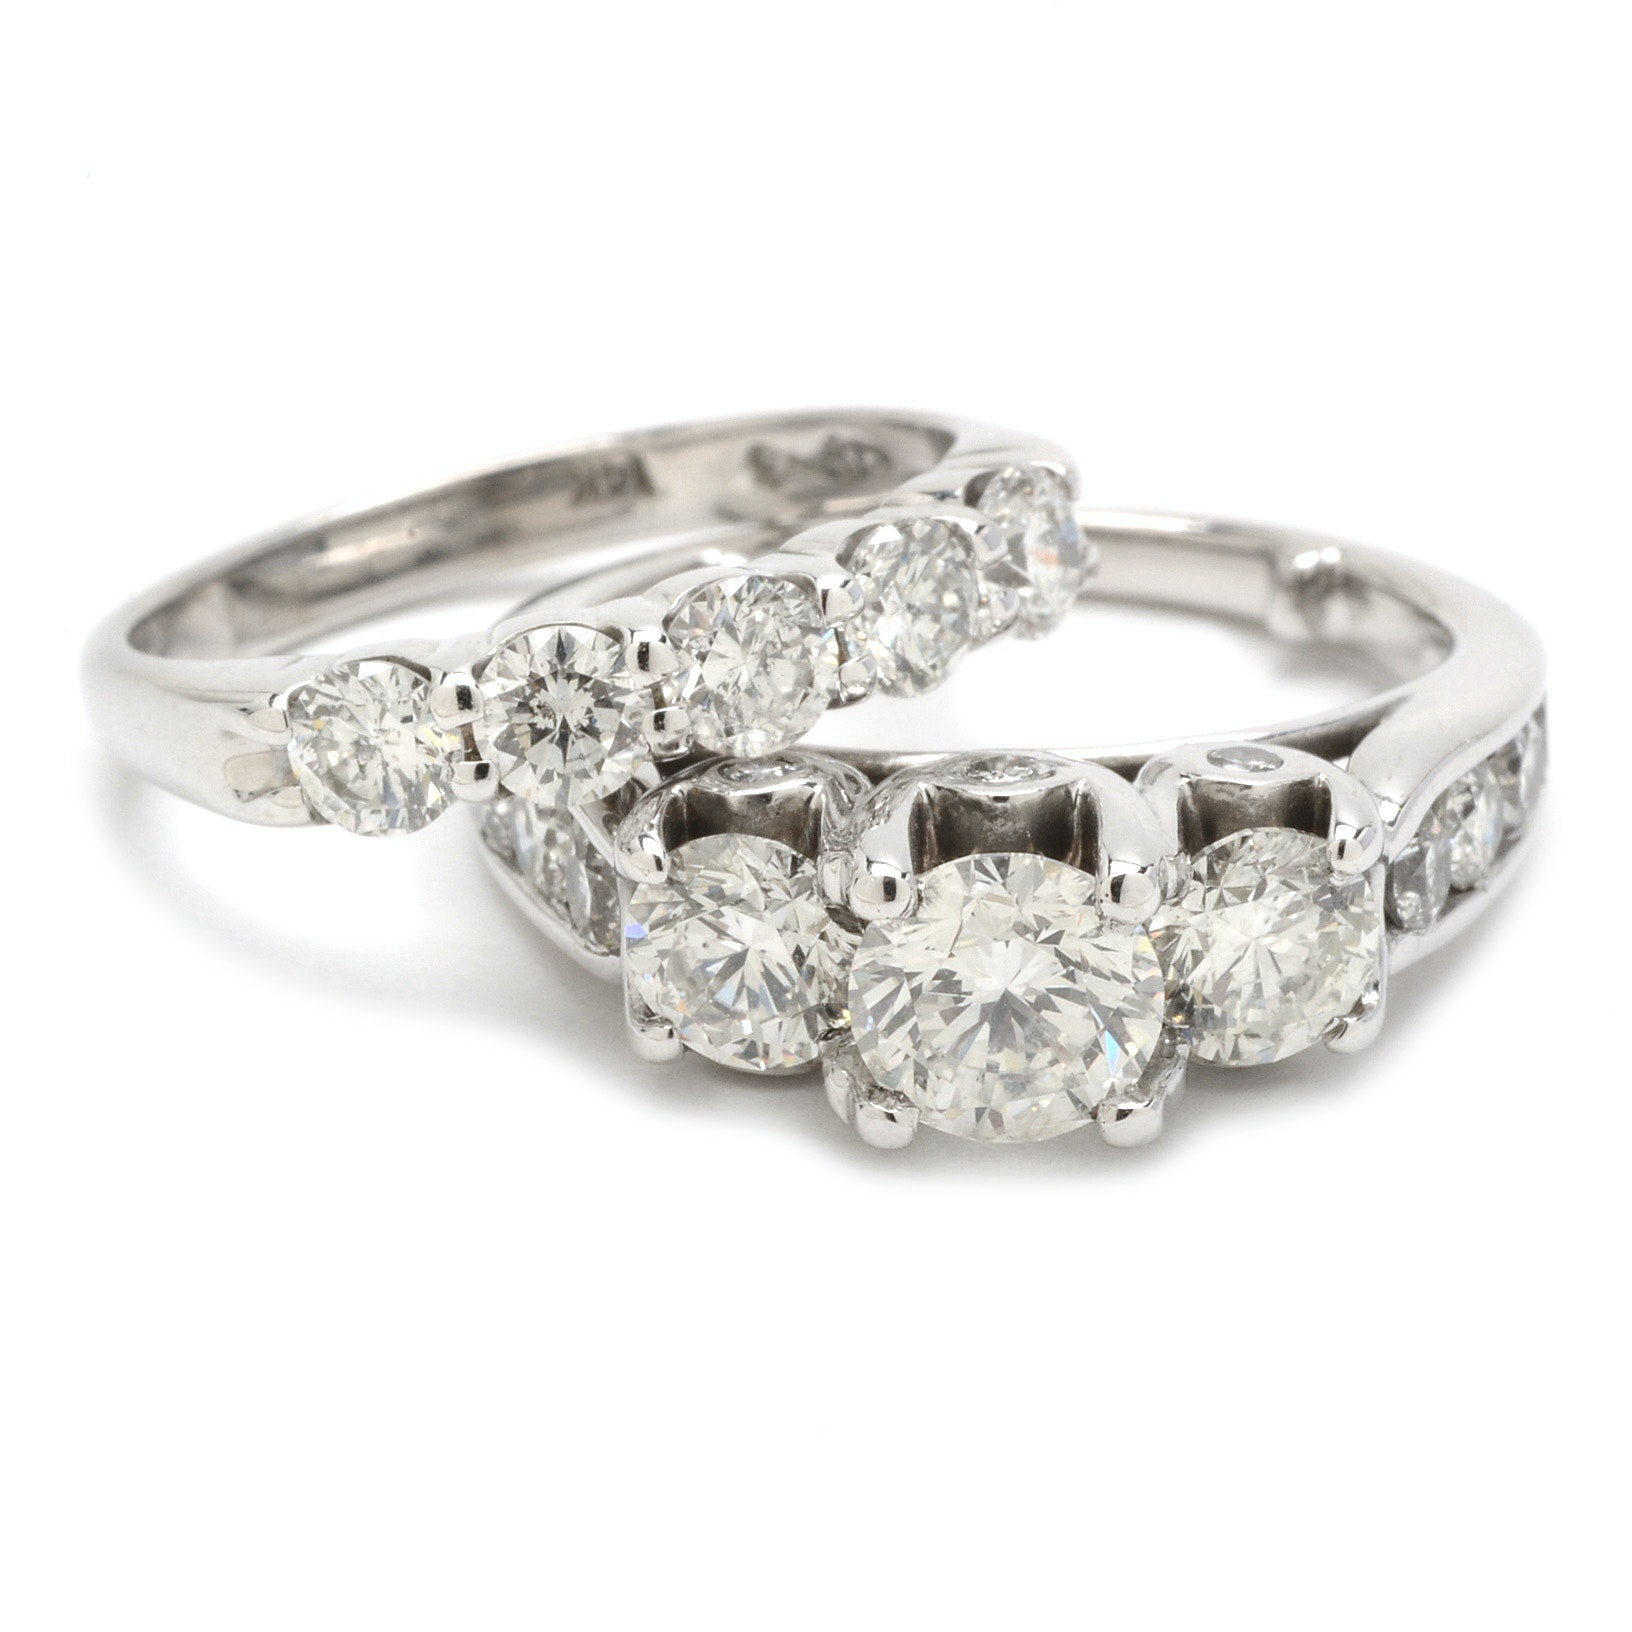 14K White Gold 2.58 CTW Diamond Wedding Ring Set